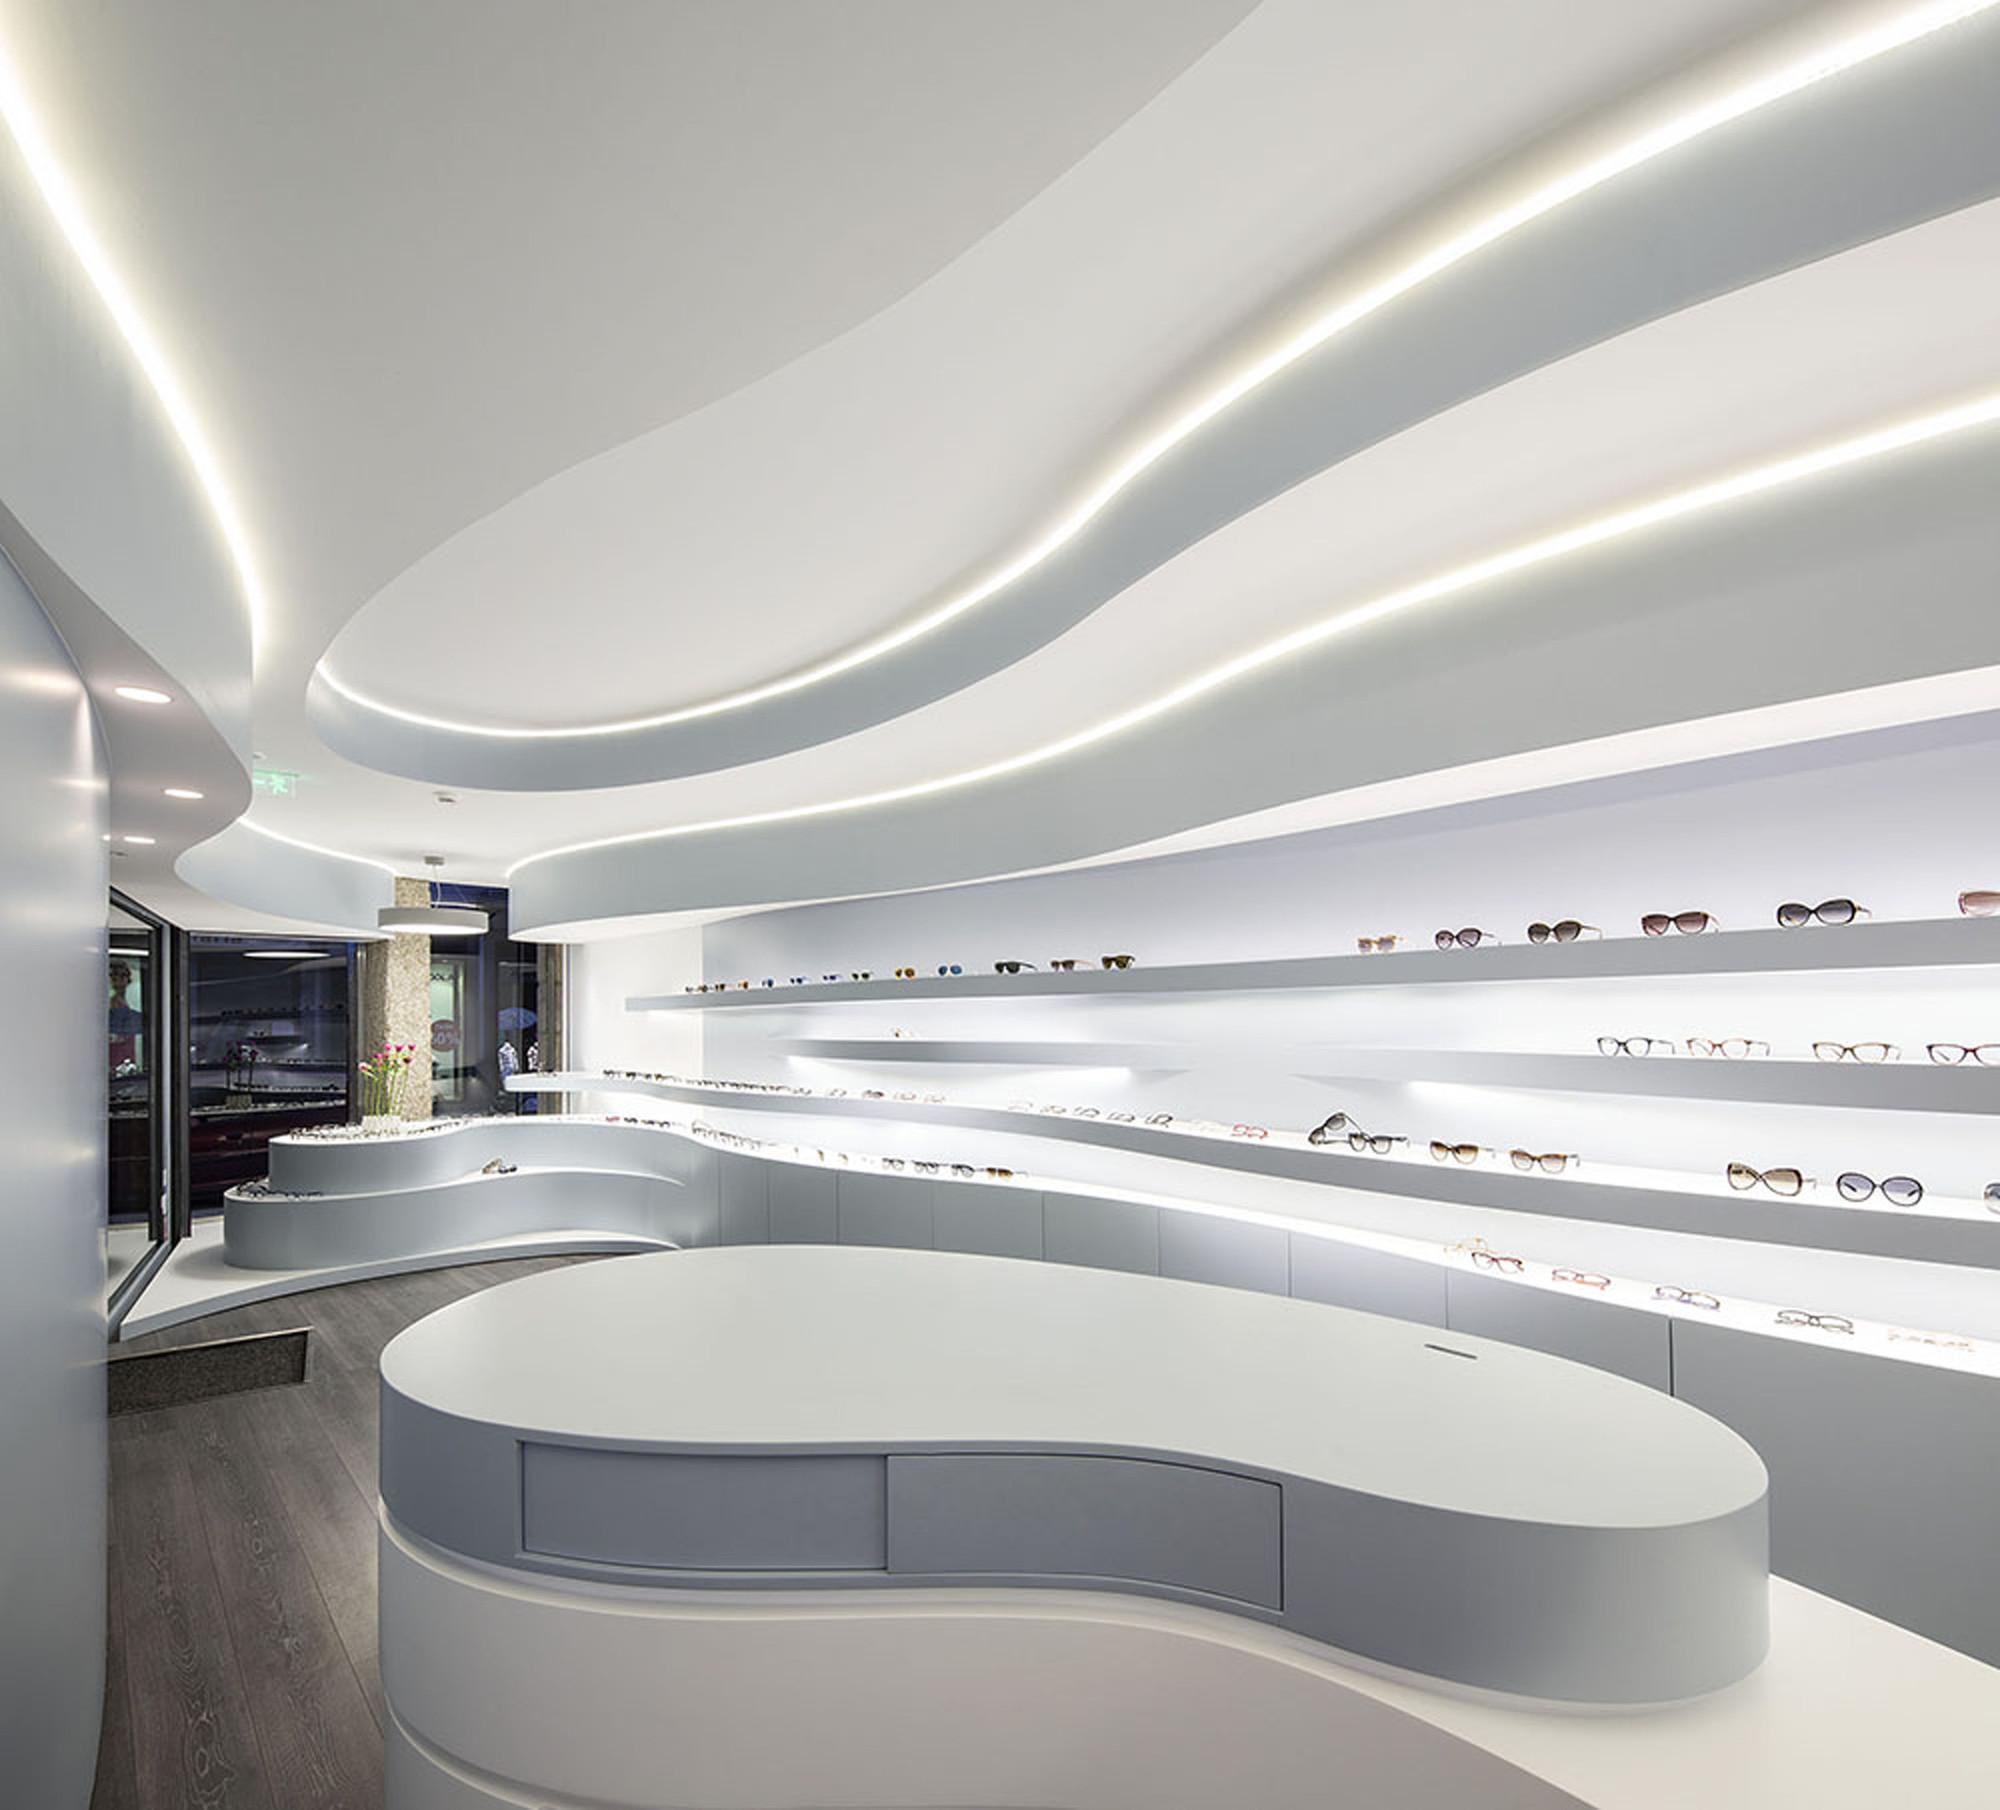 Gallery of novaoptica optic store tsou arquitectos 7 for Interior design lighting resources